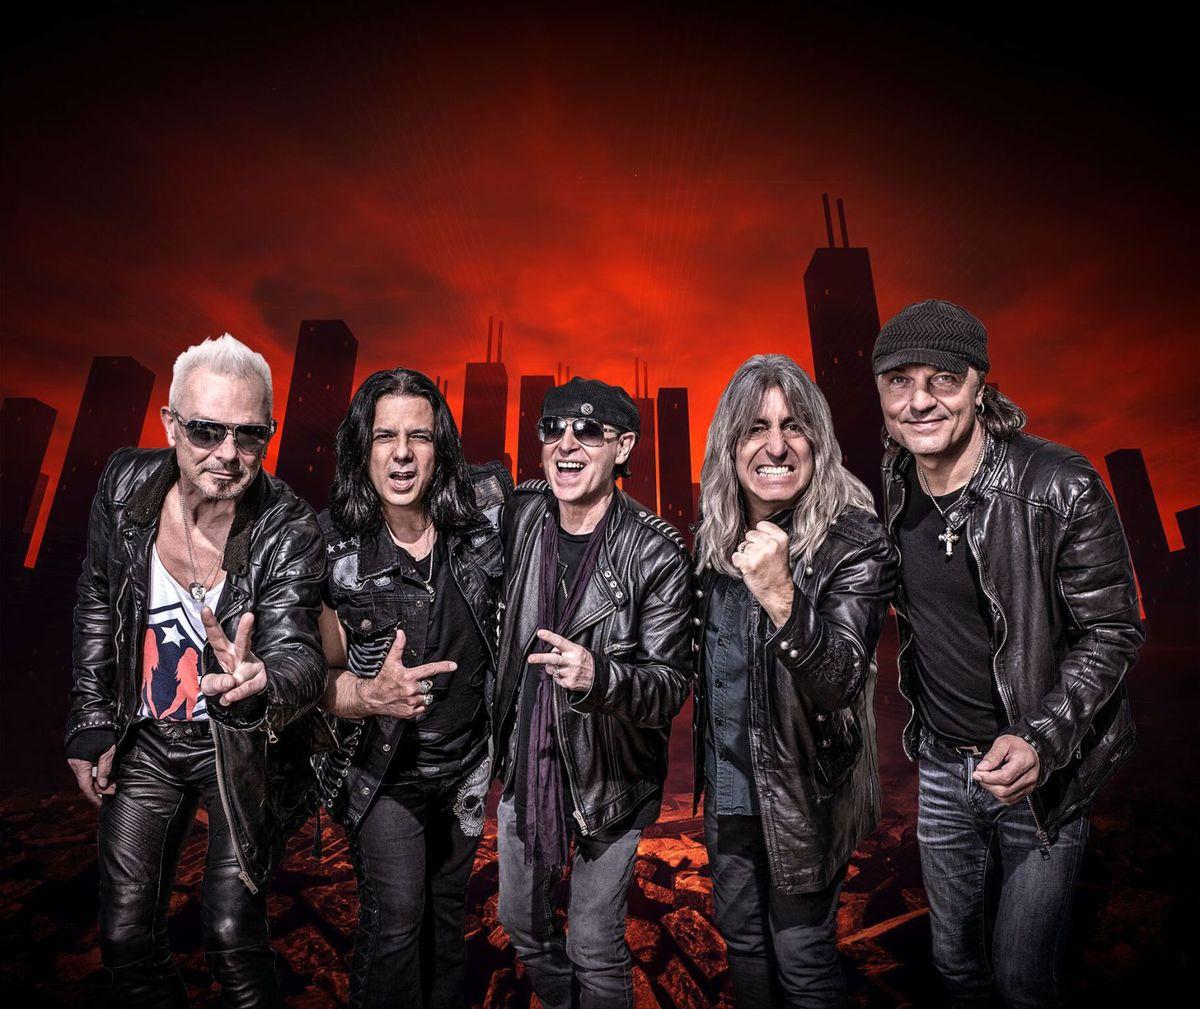 La gira de Scorpions pasa por Canarias